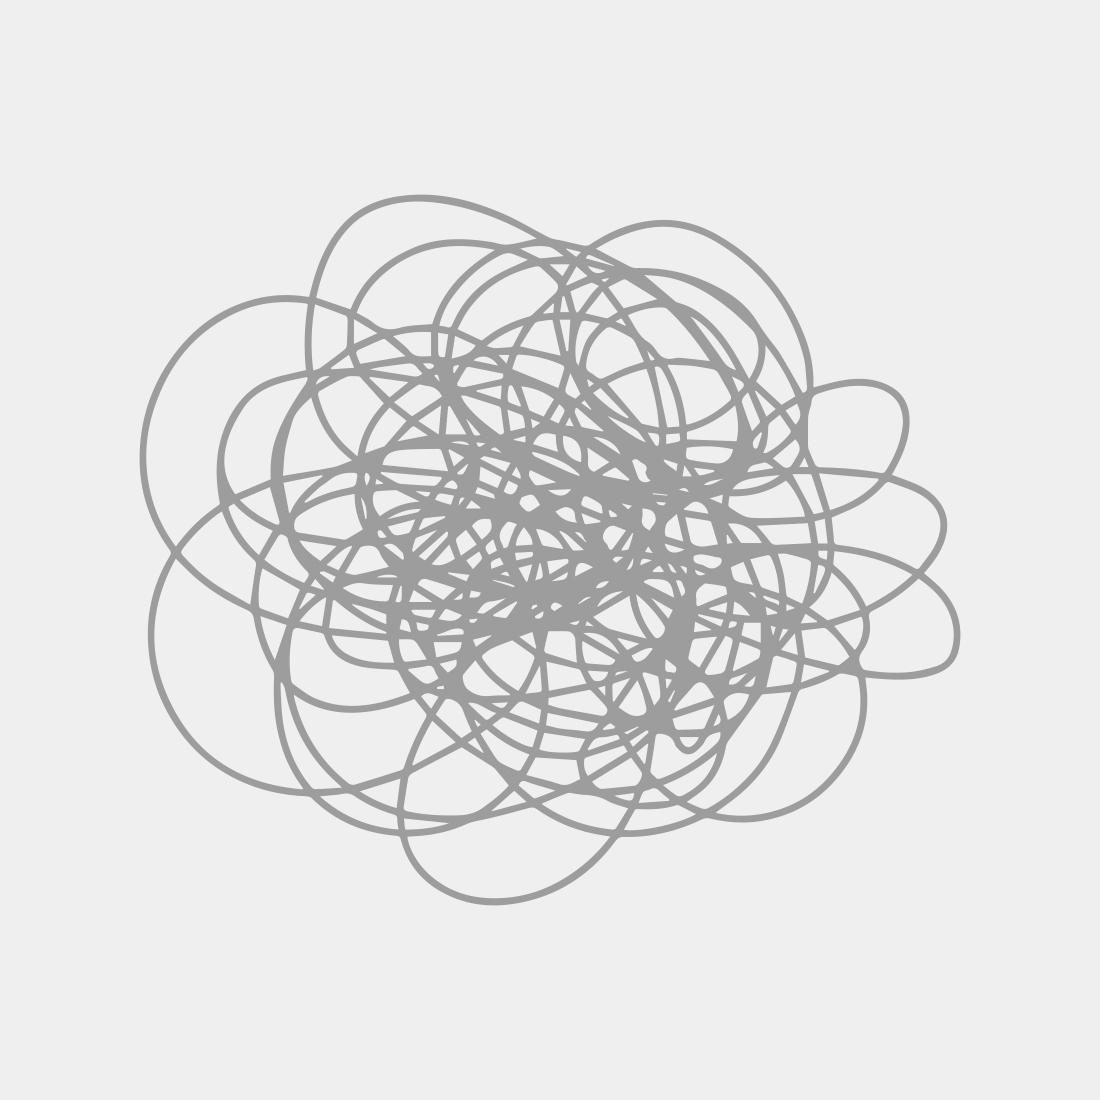 d6ef6858d030 Schiele flower tote bag royal academy of arts shop royal academy of arts  jpg 1200x1200 Flower